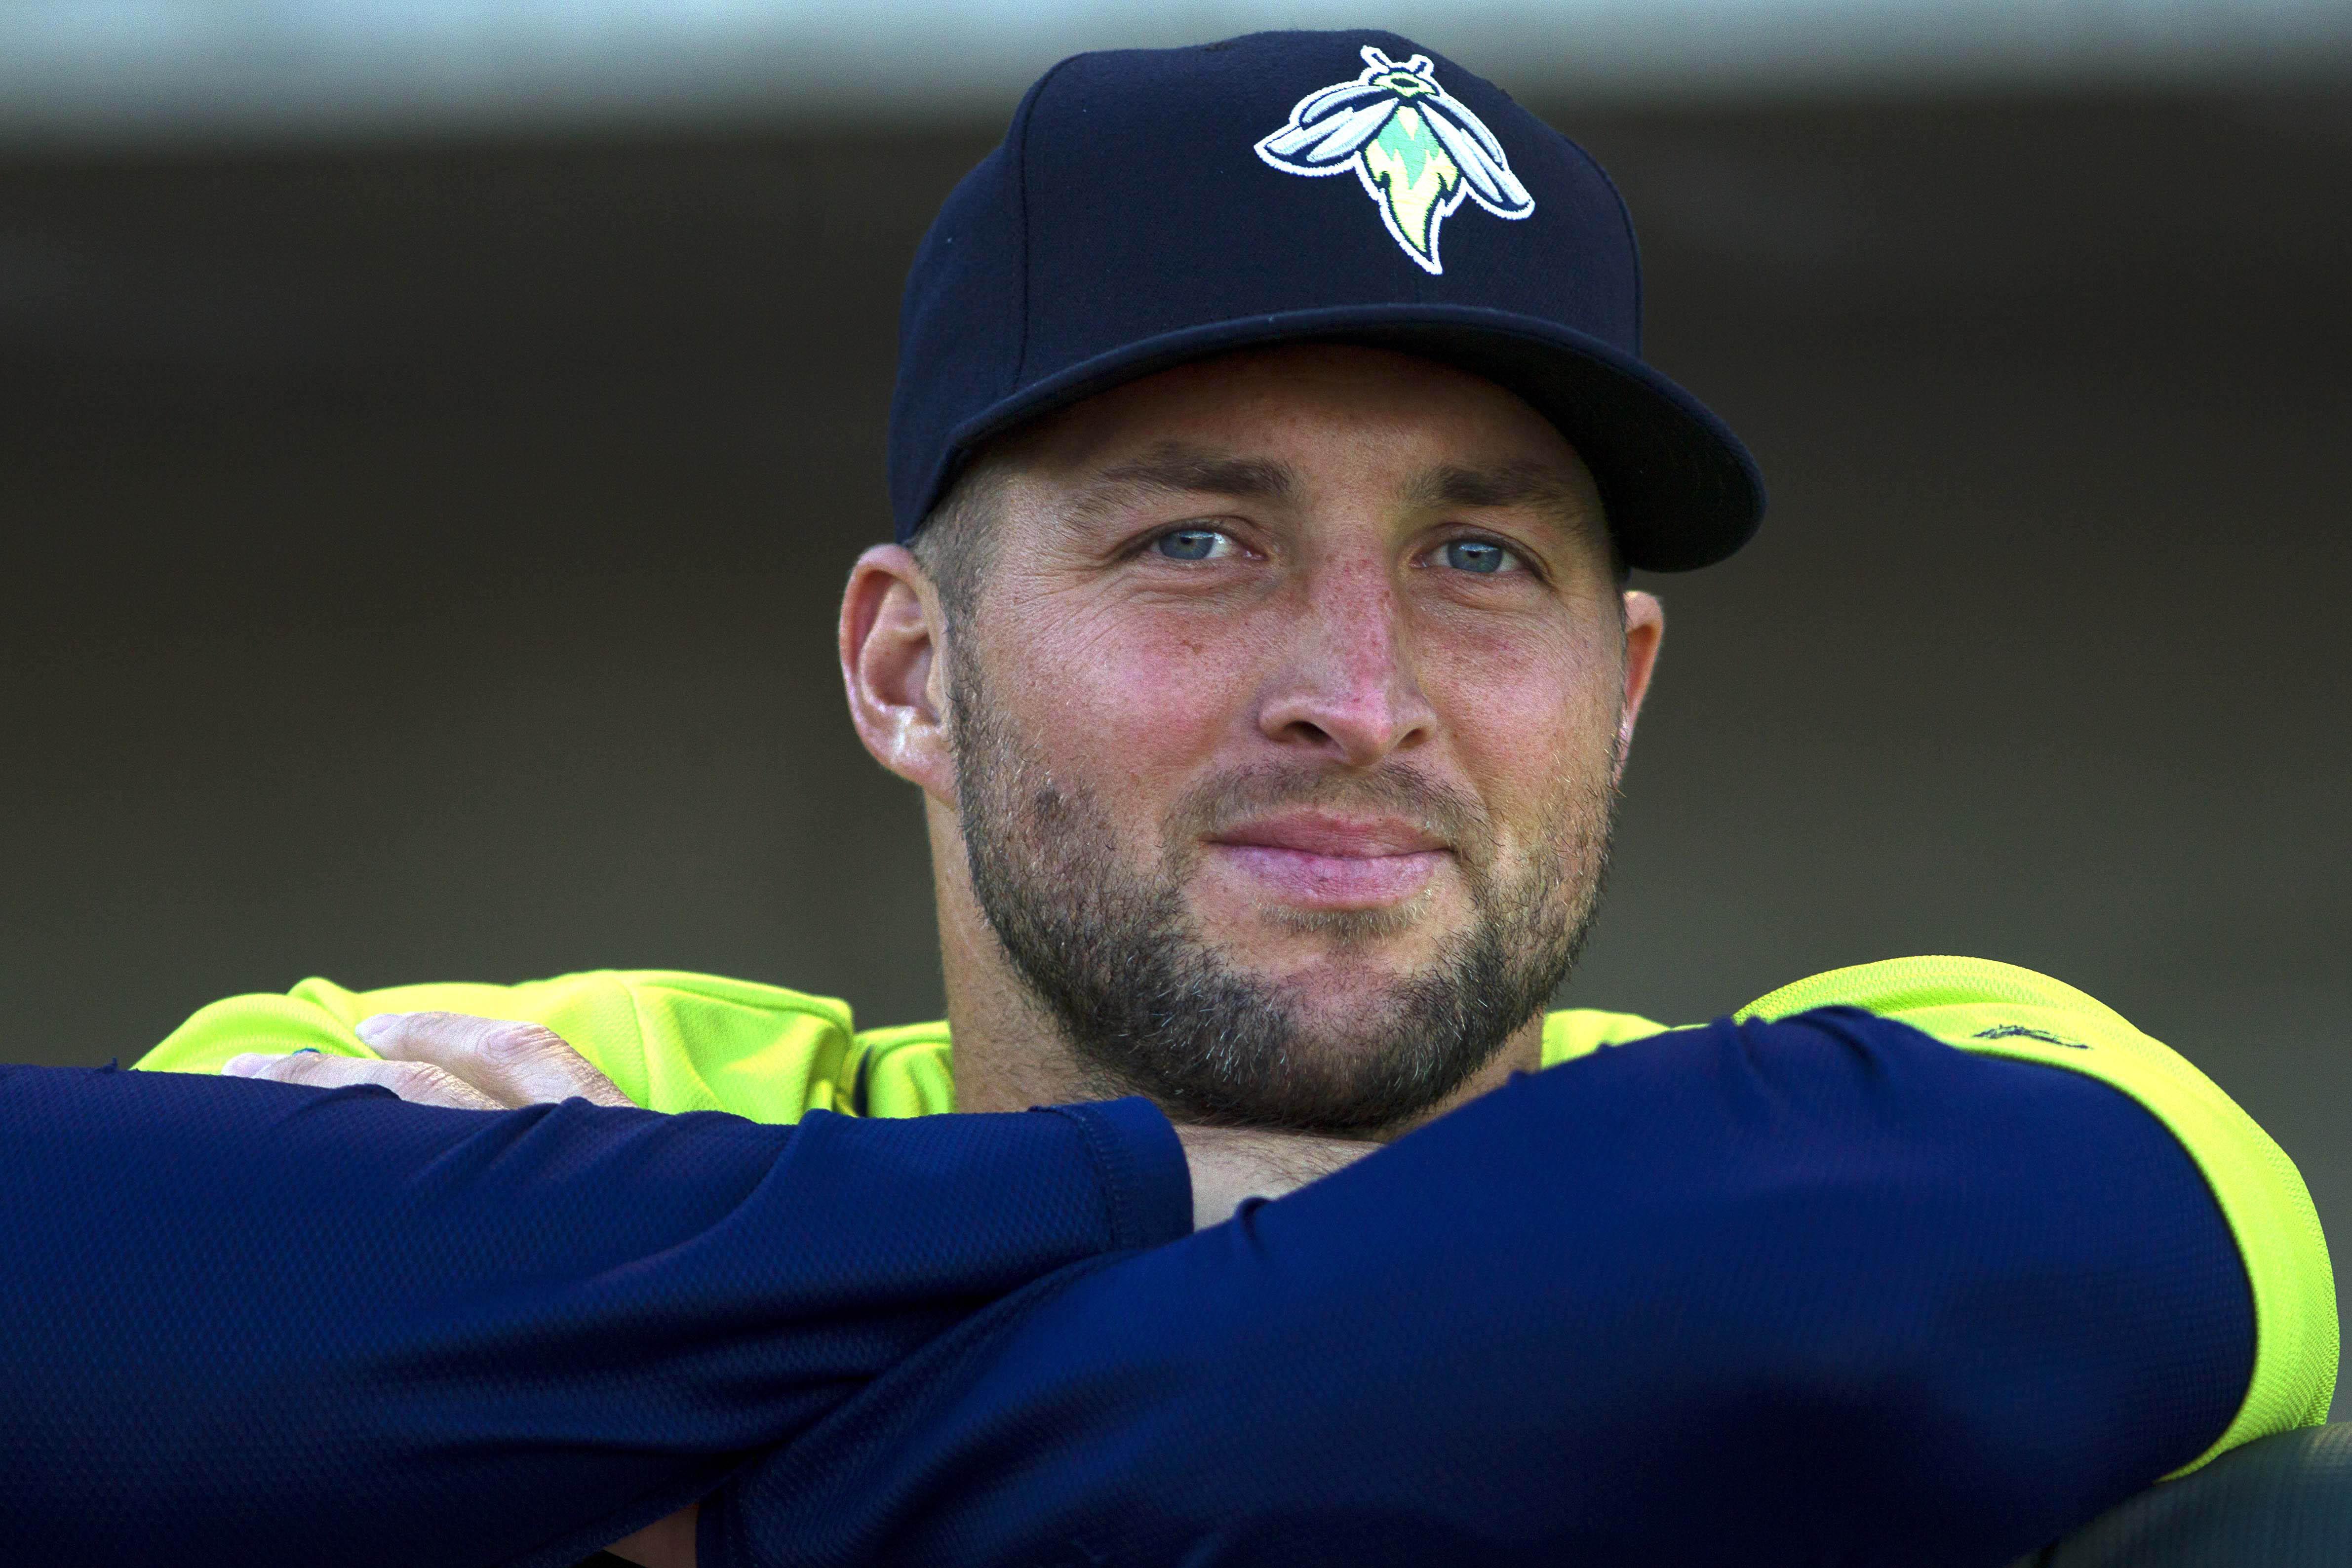 9998585-minor-league-baseball-augusta-greenjackets-at-columbia-fireflies-1